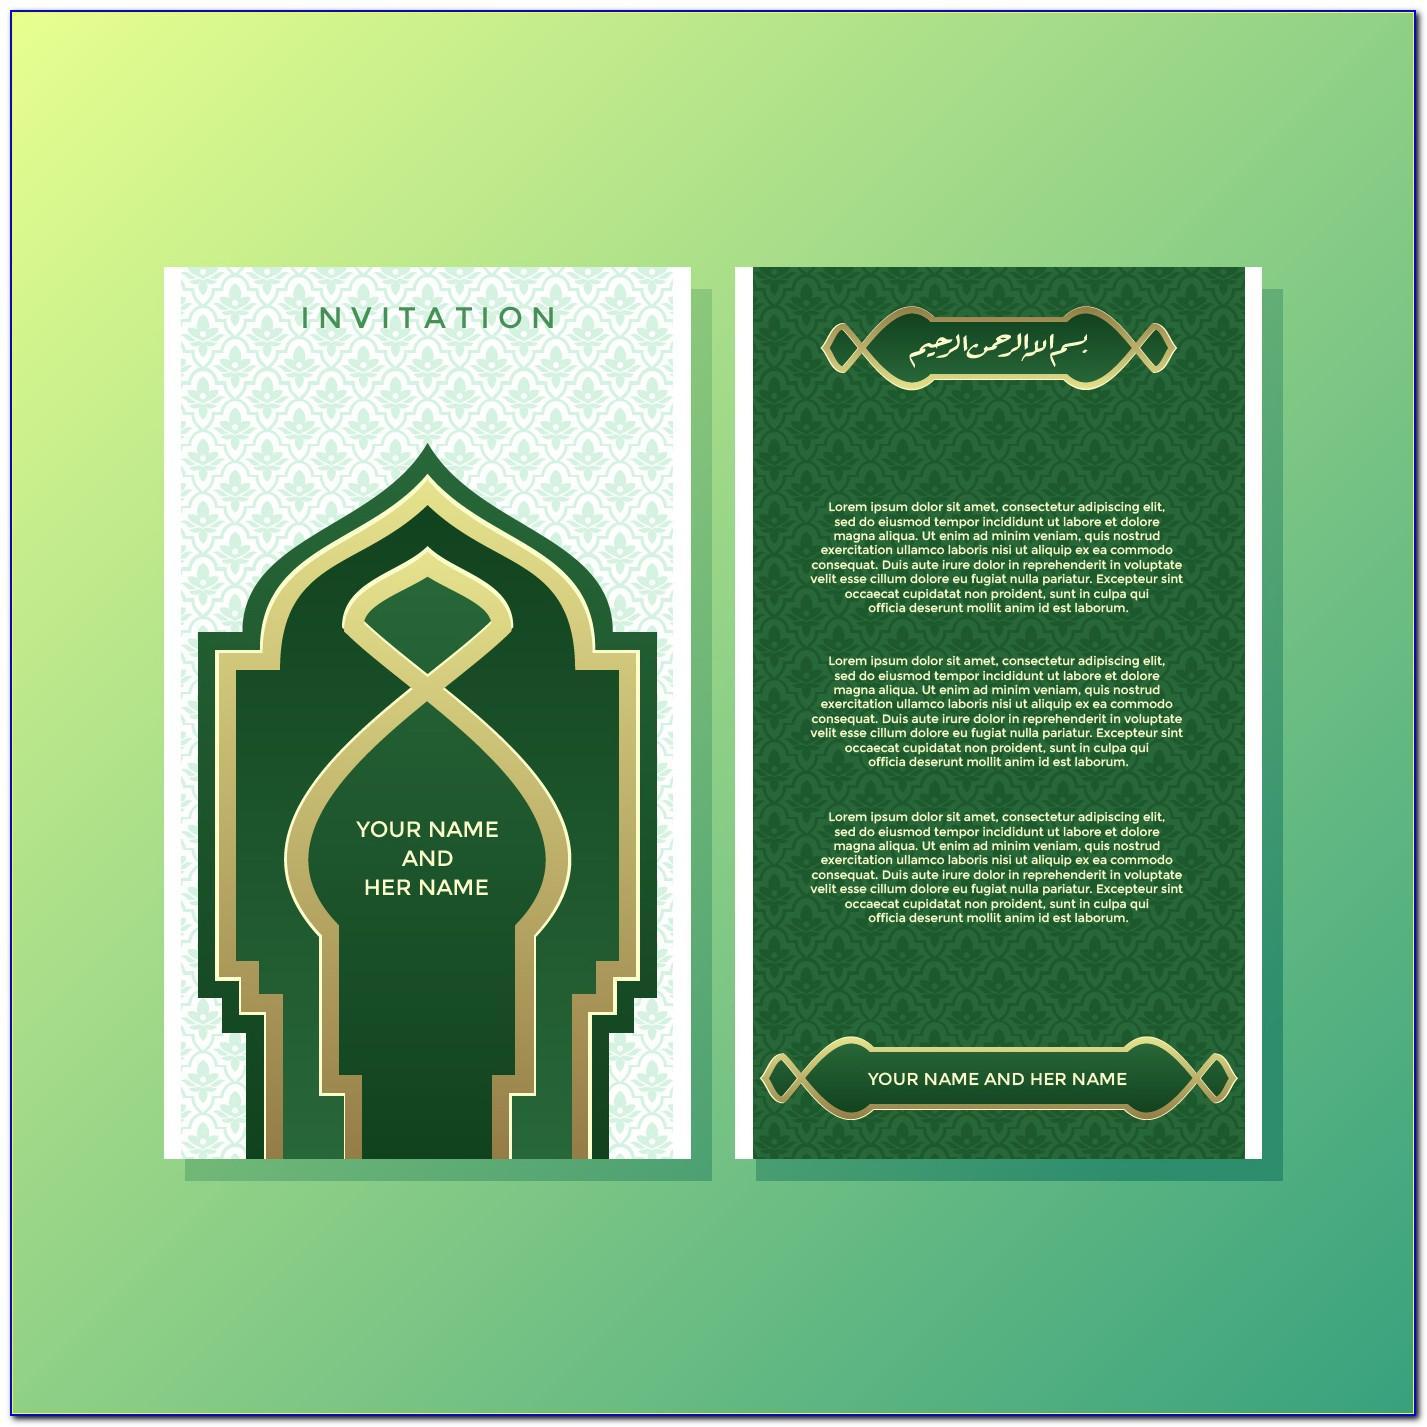 Free Muslim Wedding Invitation Templates For Word